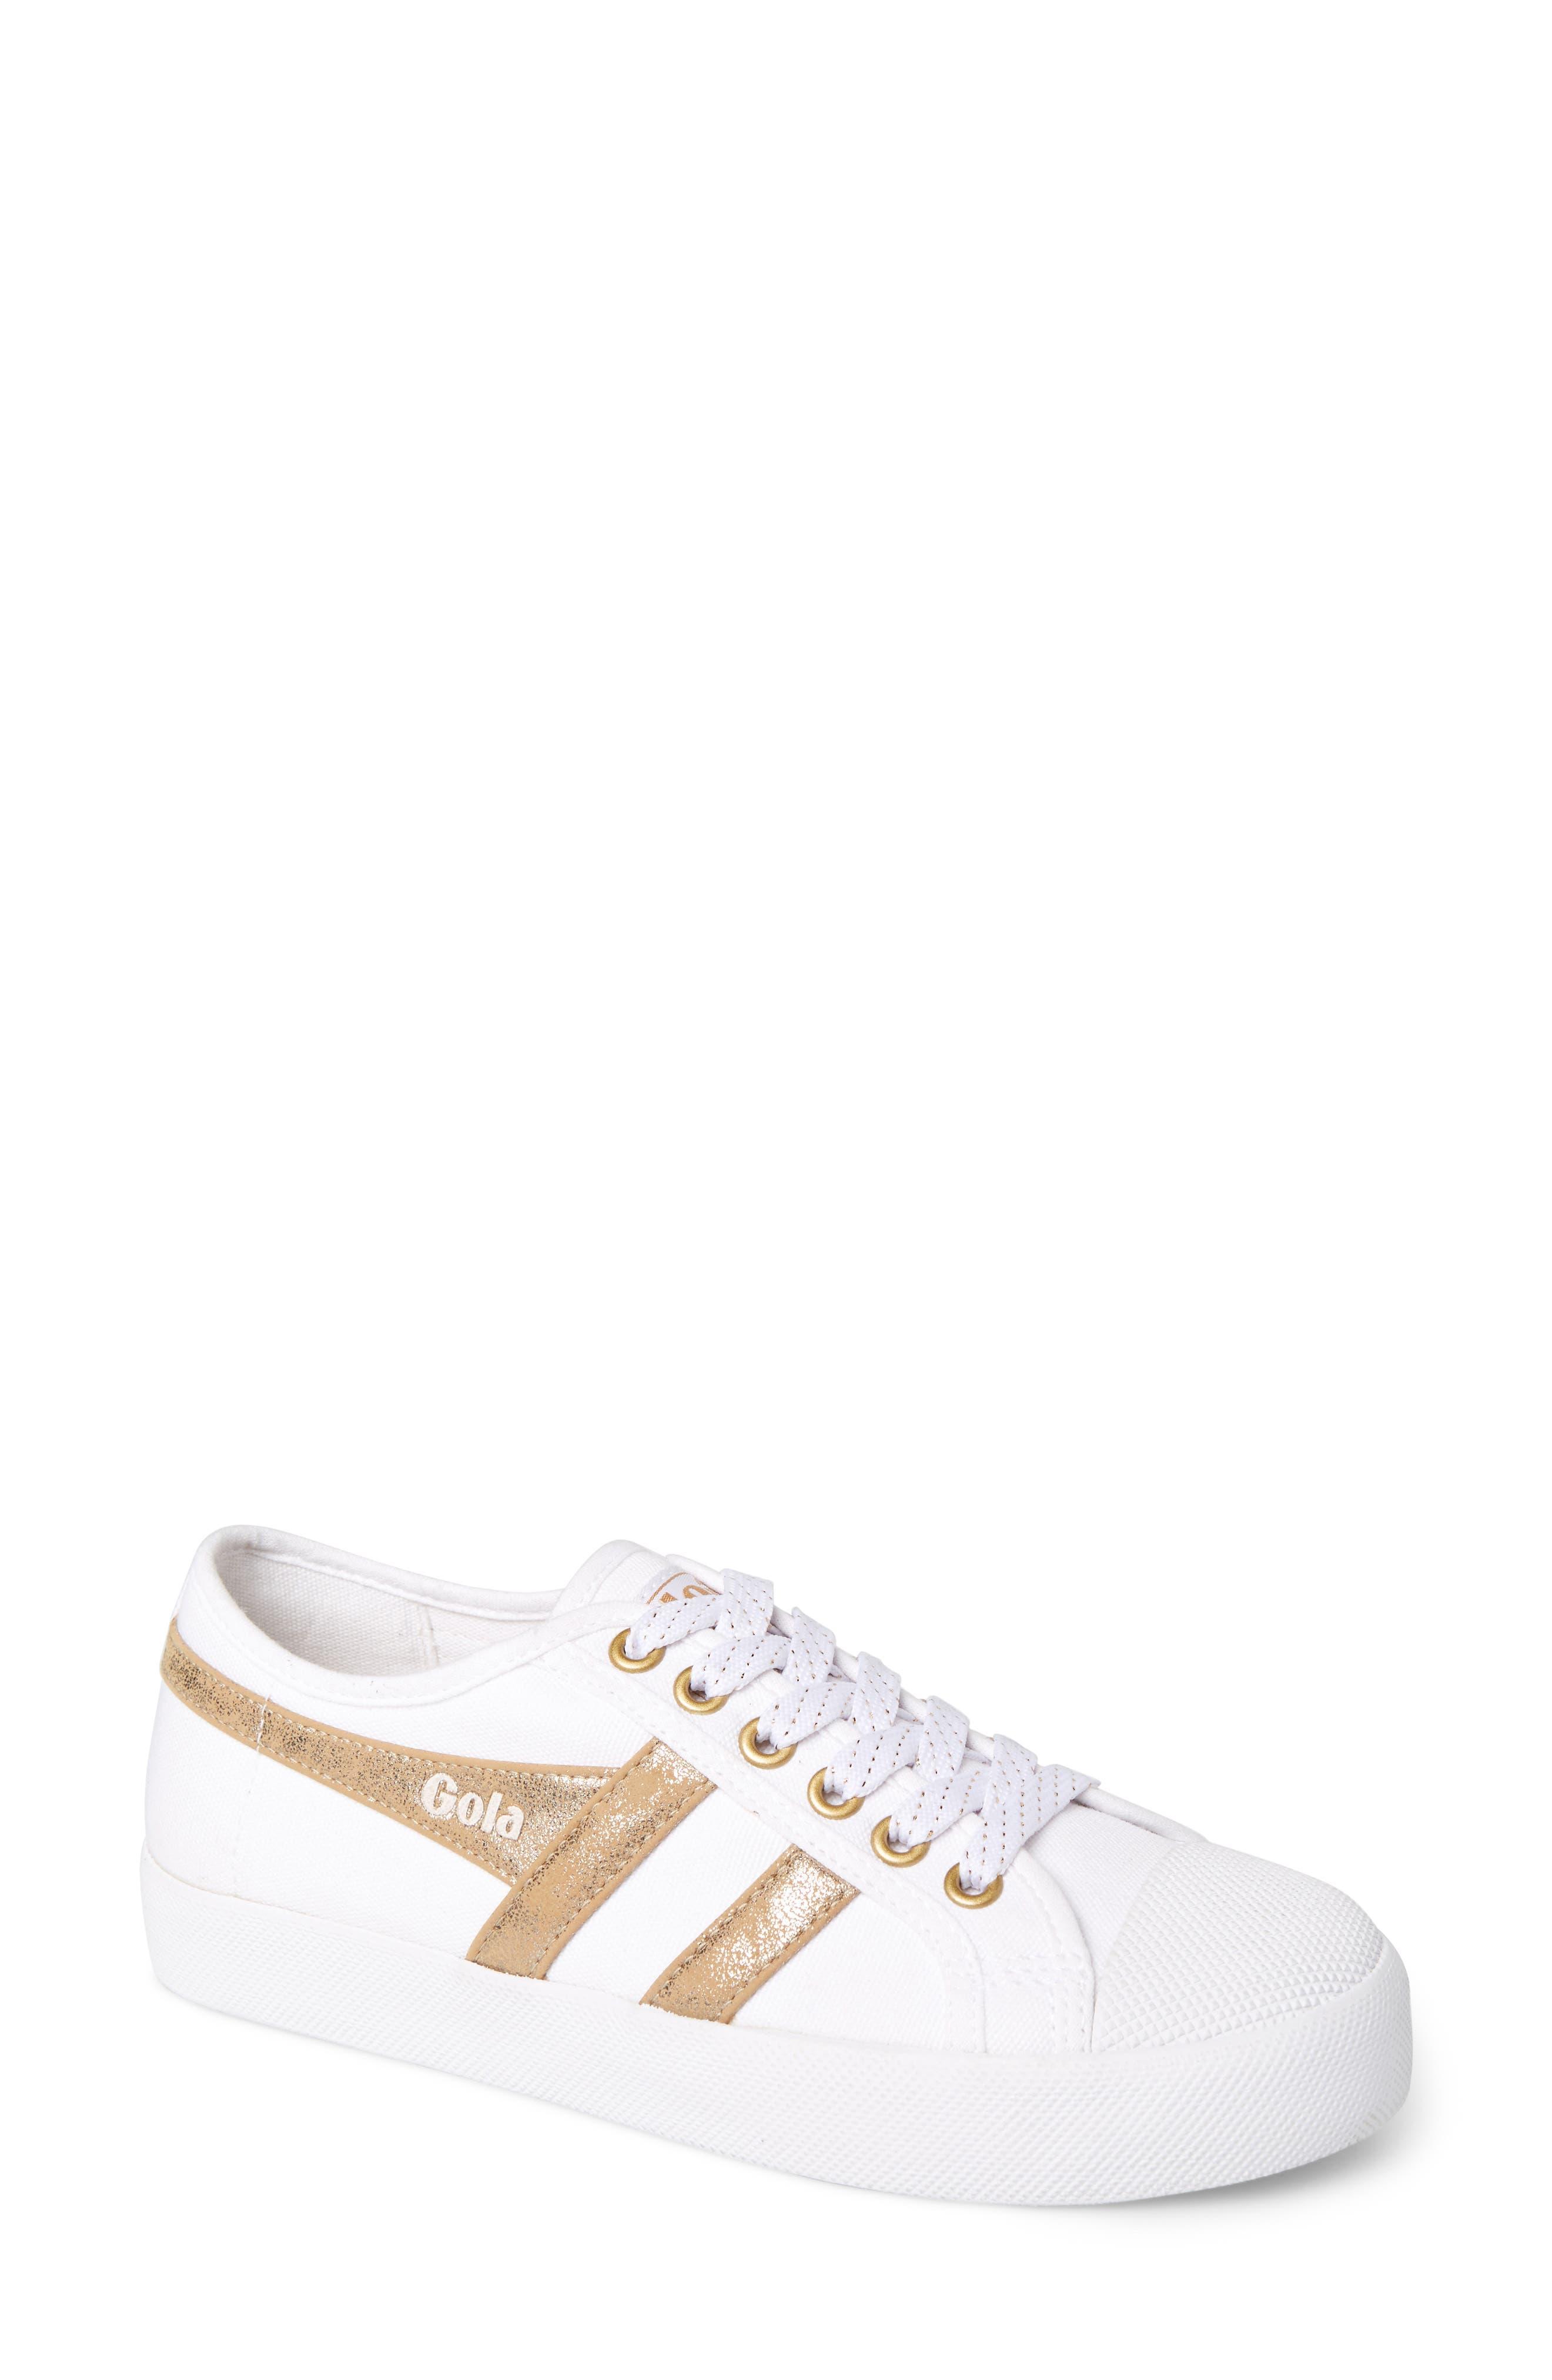 GOLA,                             Coaster Mirror Sneaker,                             Main thumbnail 1, color,                             WHITE/ GOLD